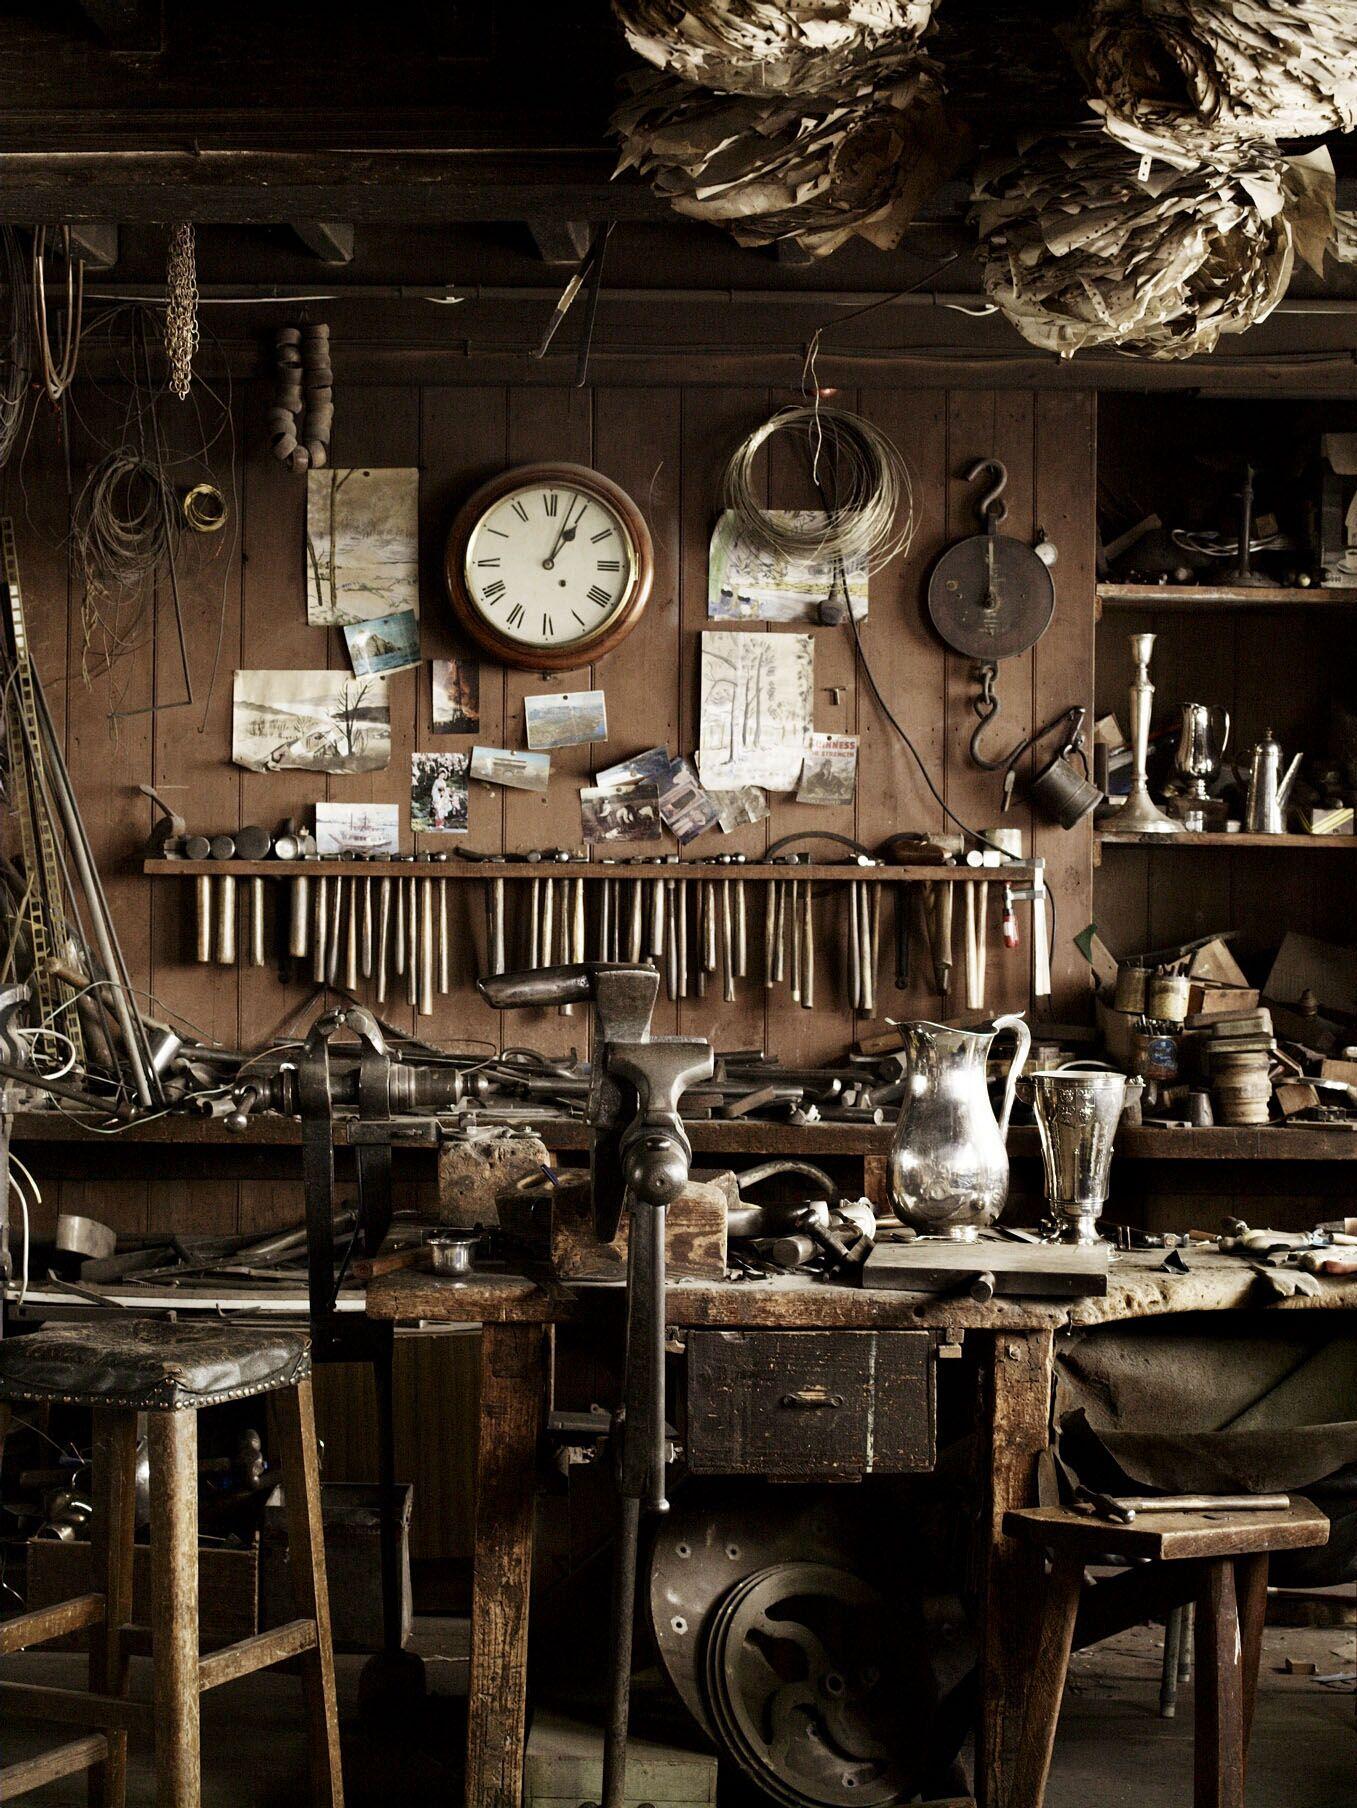 Hart Silversmiths - Chipping Camden, Gloucestershire